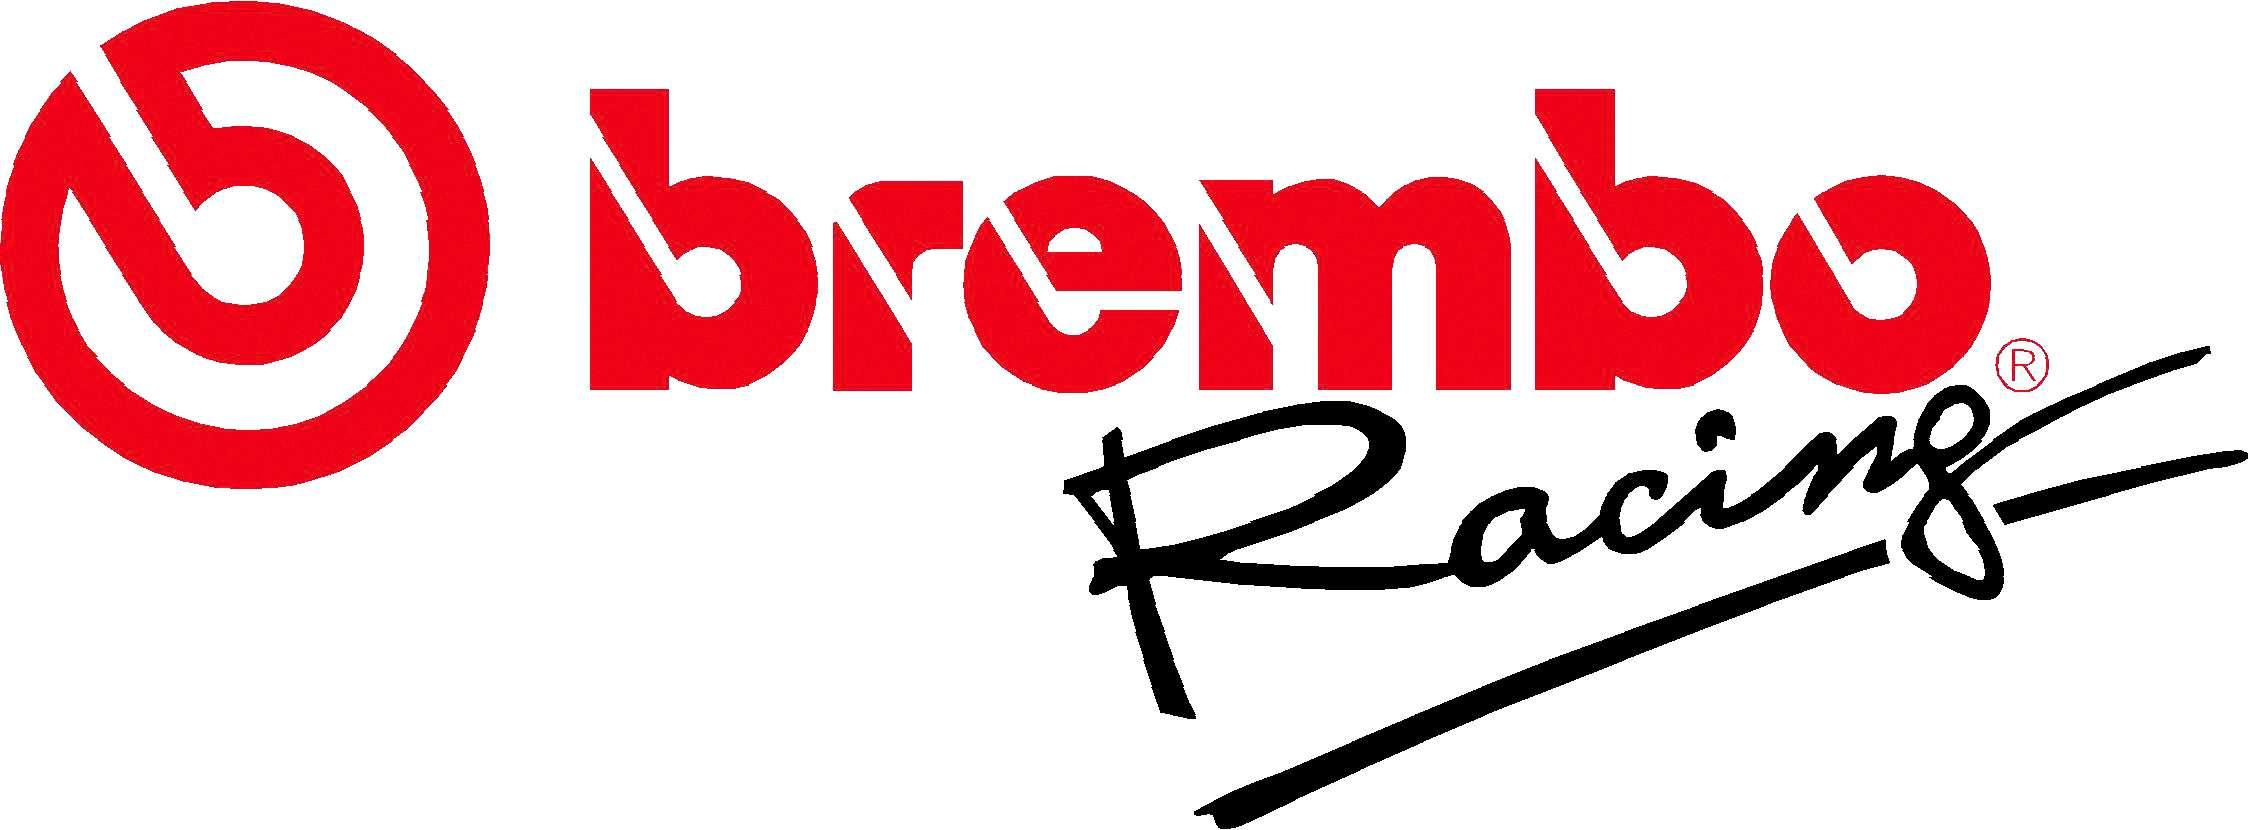 brembo_racing-logoOK